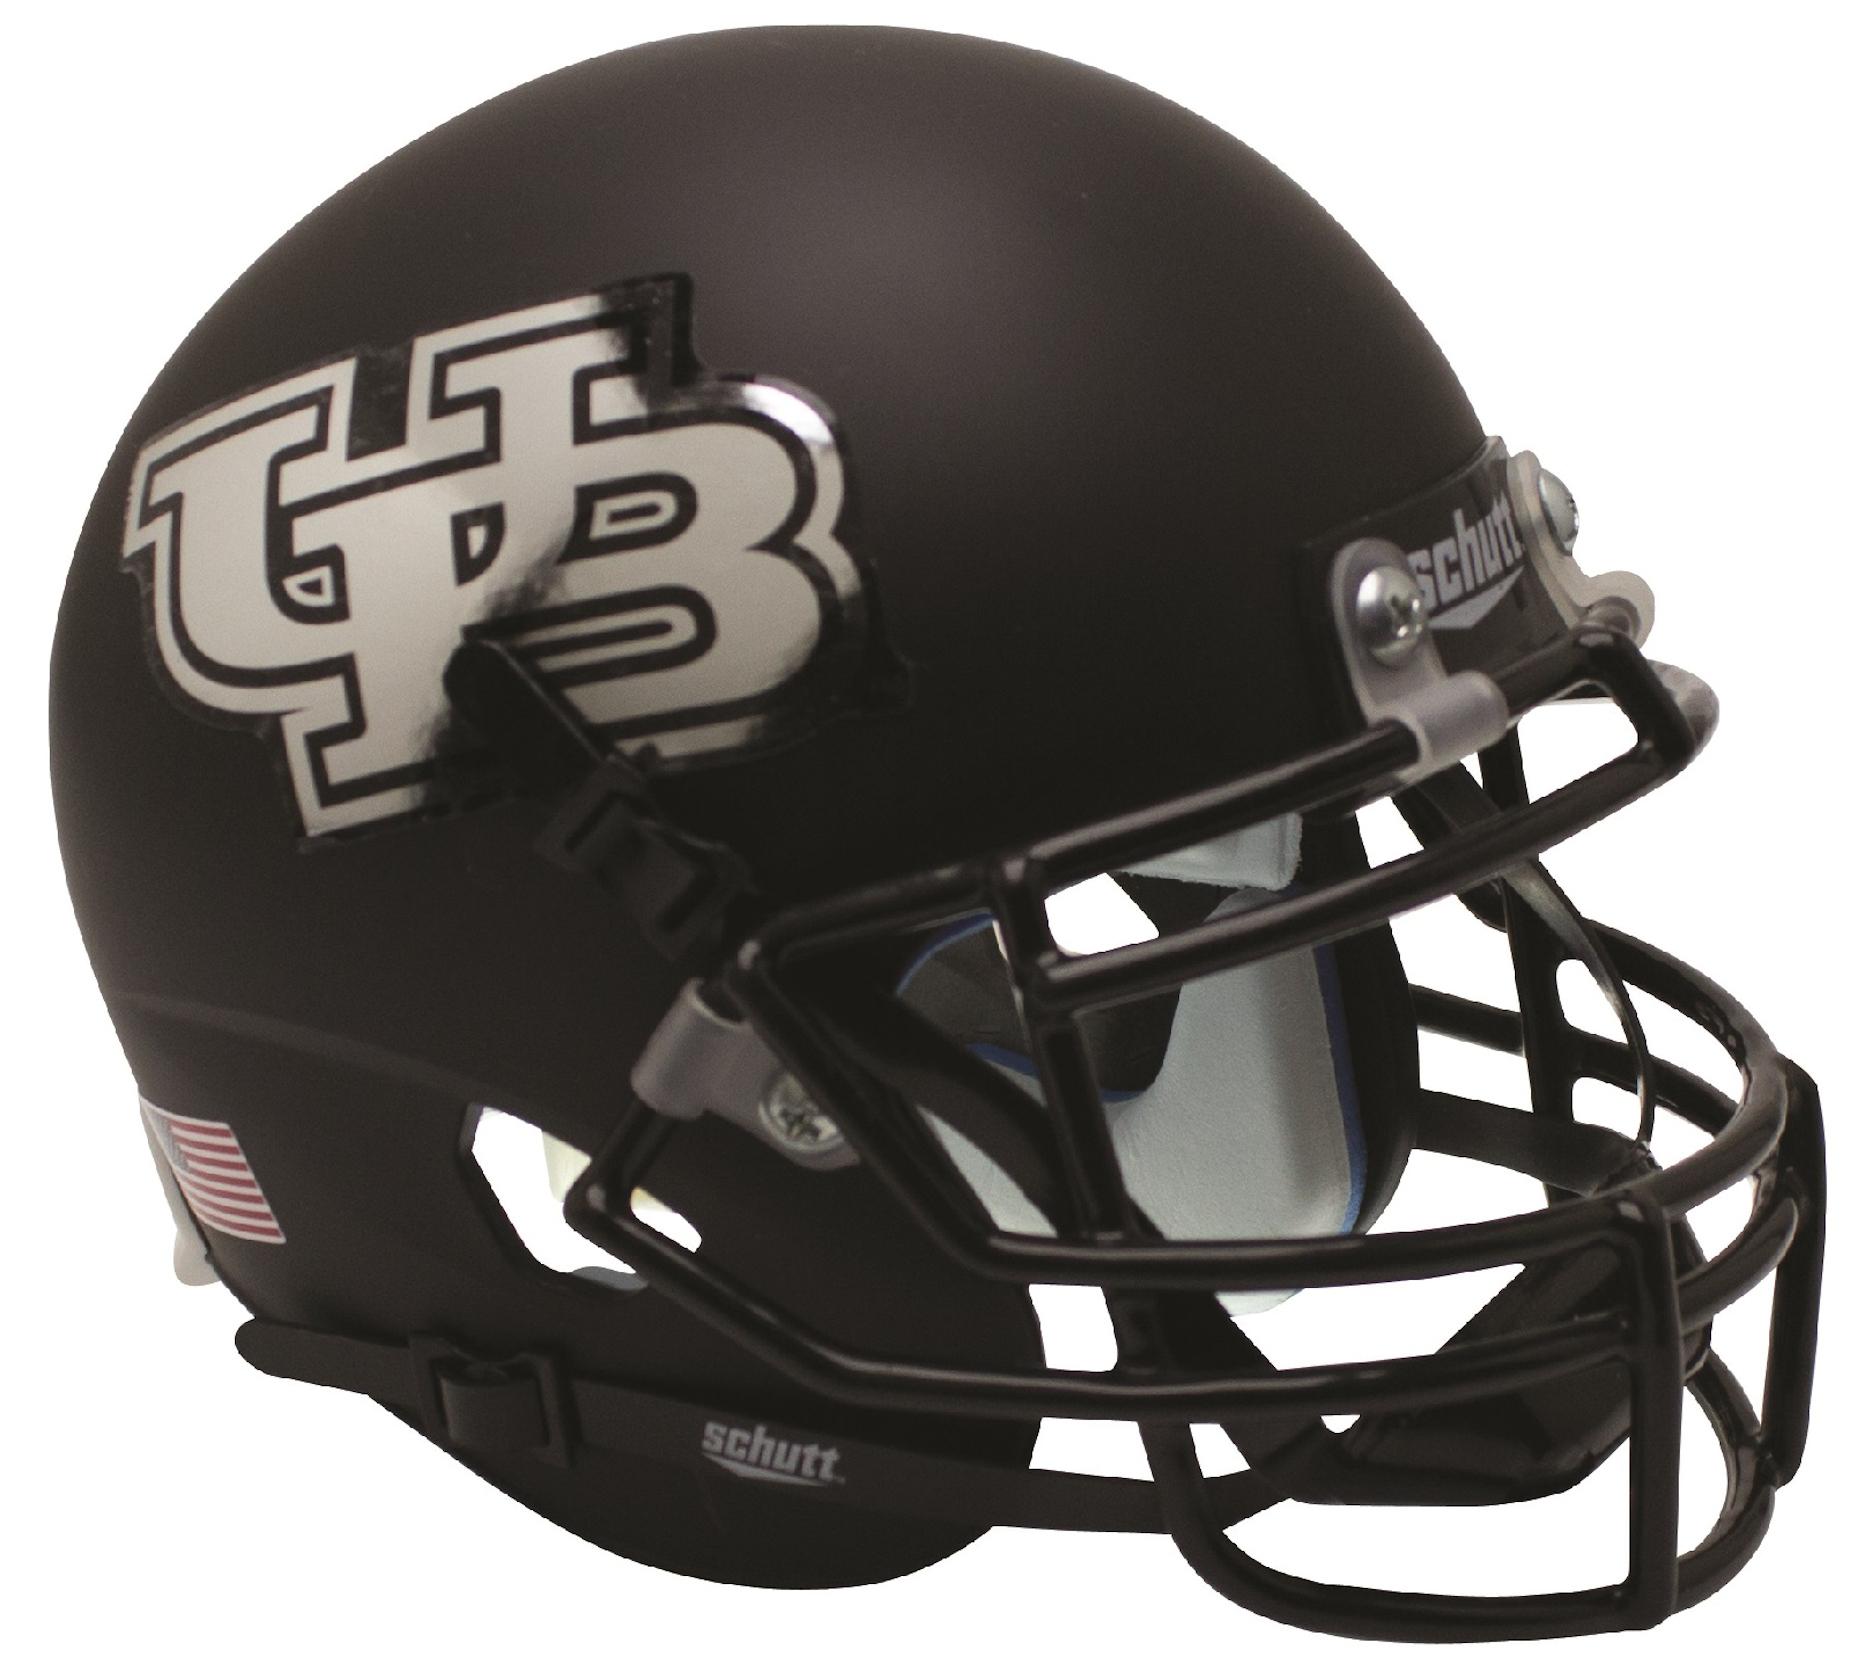 Buffalo Bulls Authentic College XP Football Helmet Schutt <B>Matte Black</B>